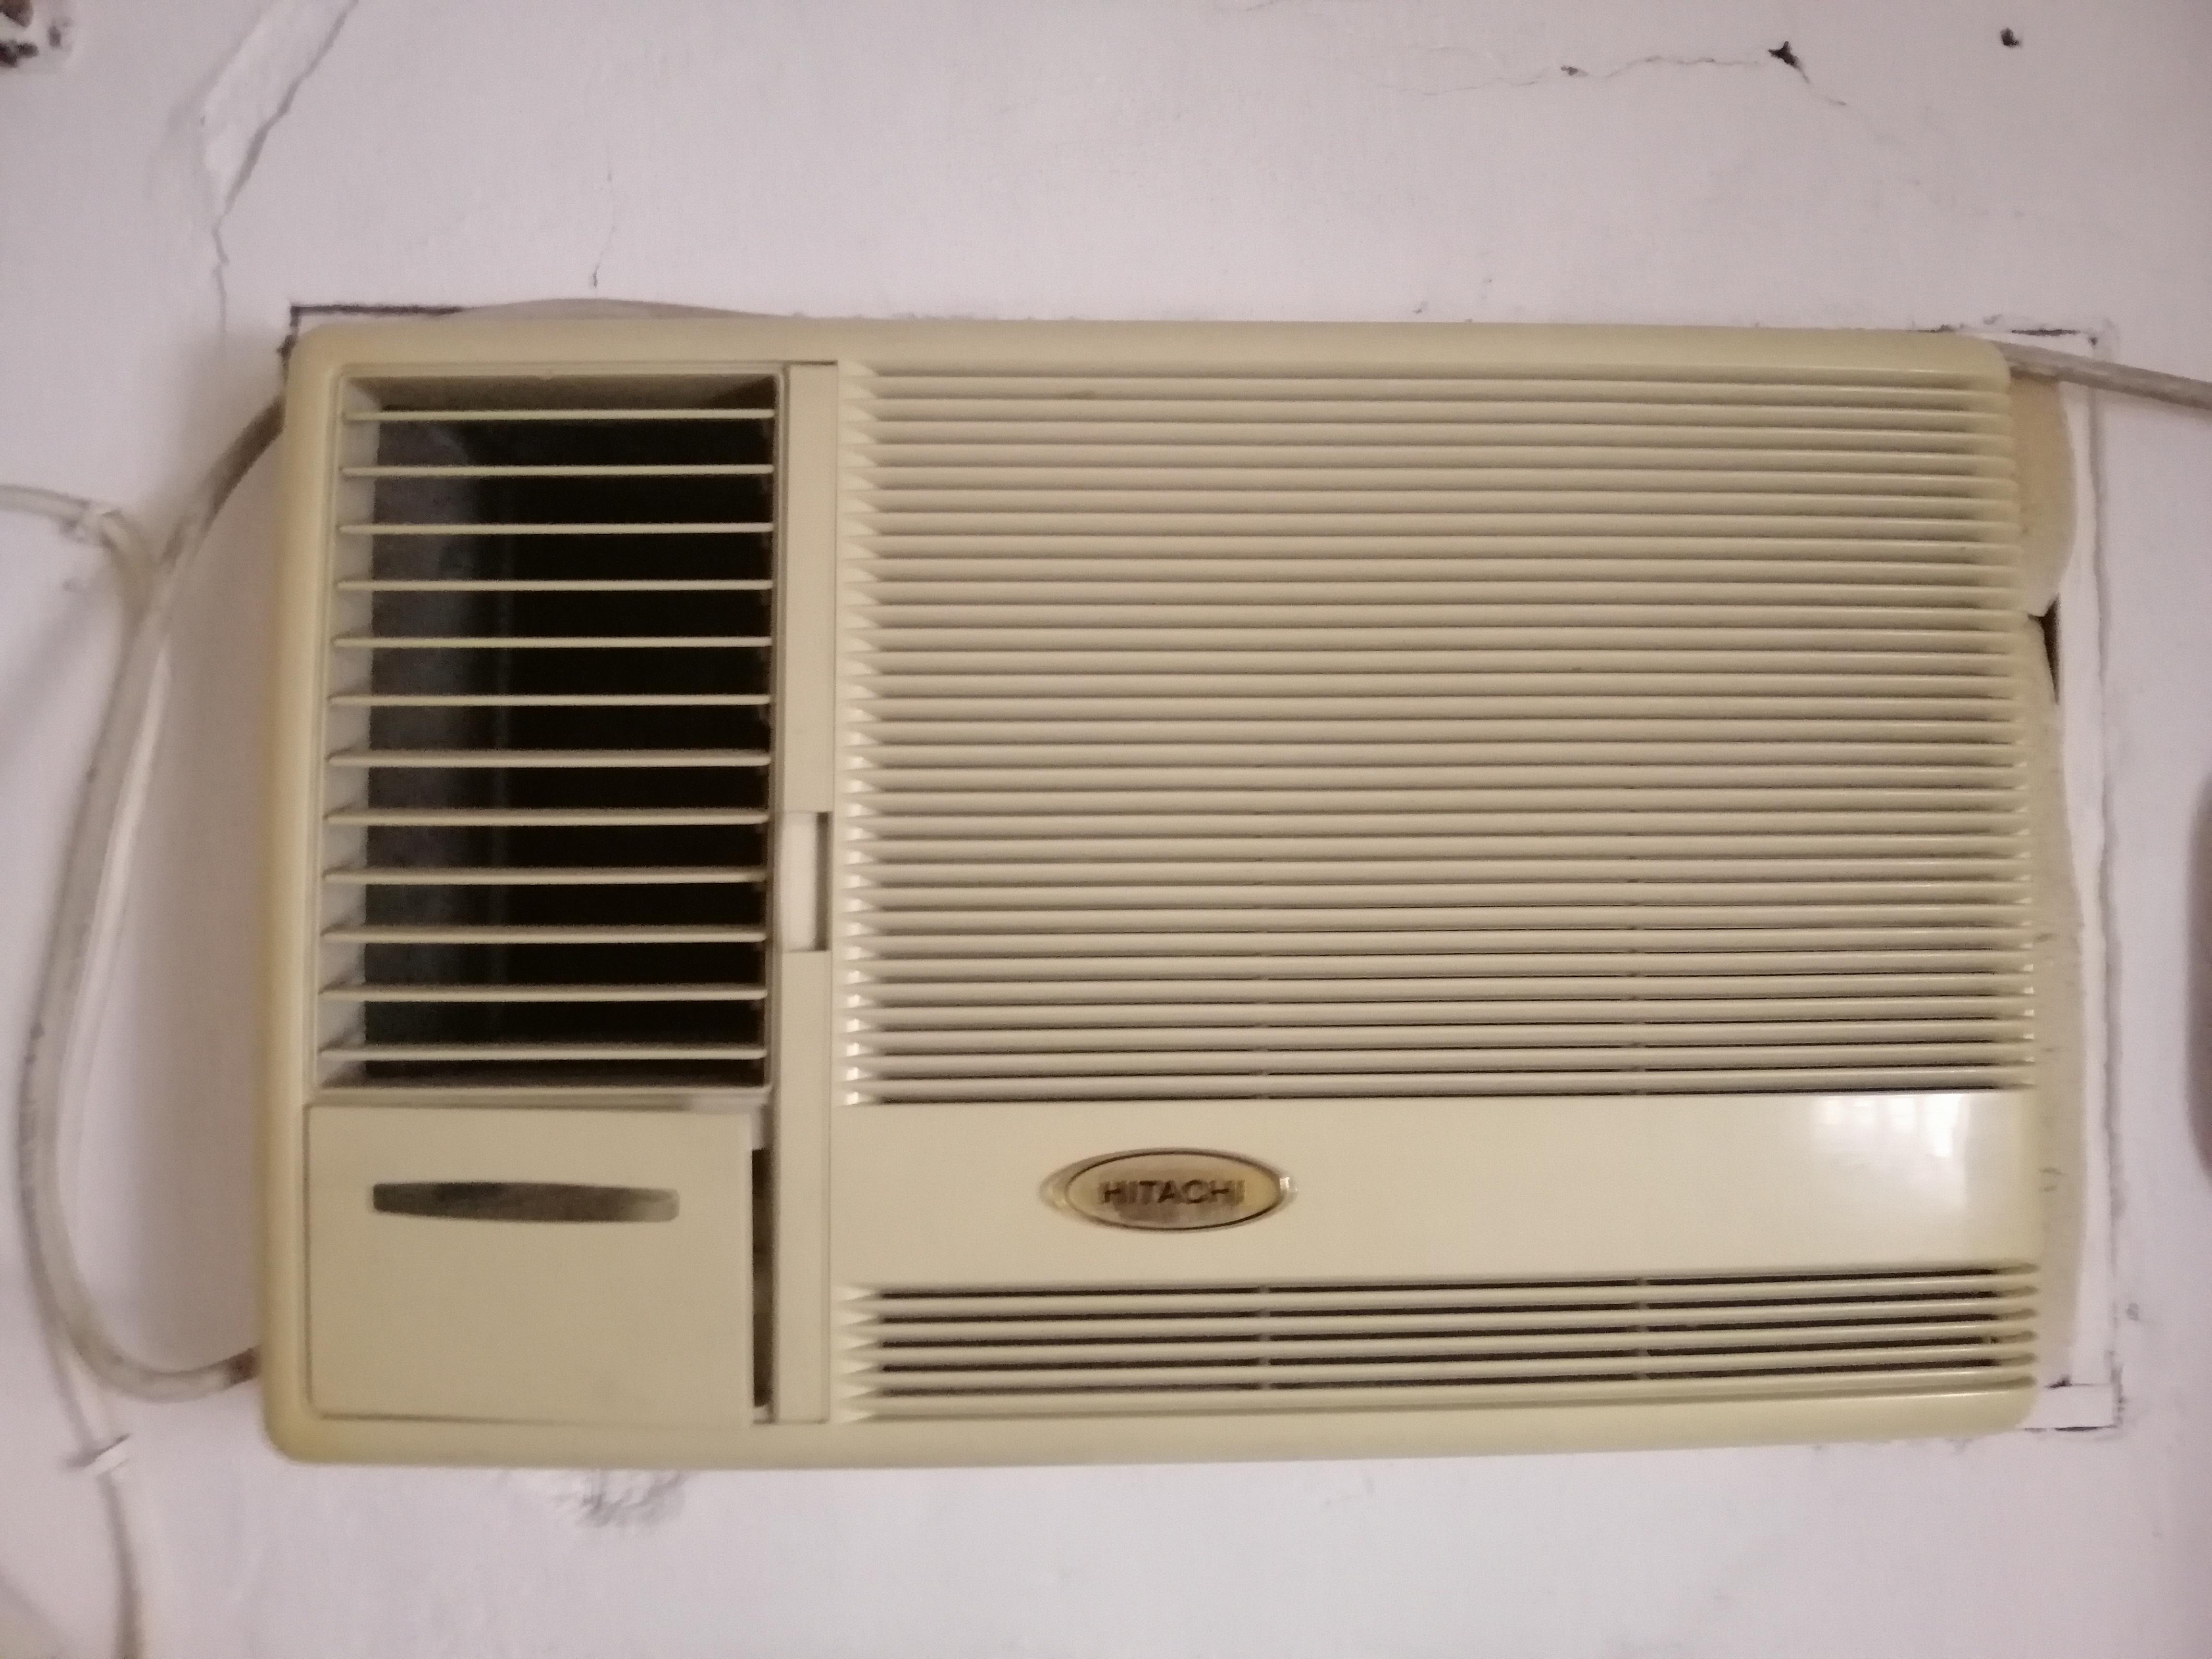 Hitachi AC 1.5ton window Ac